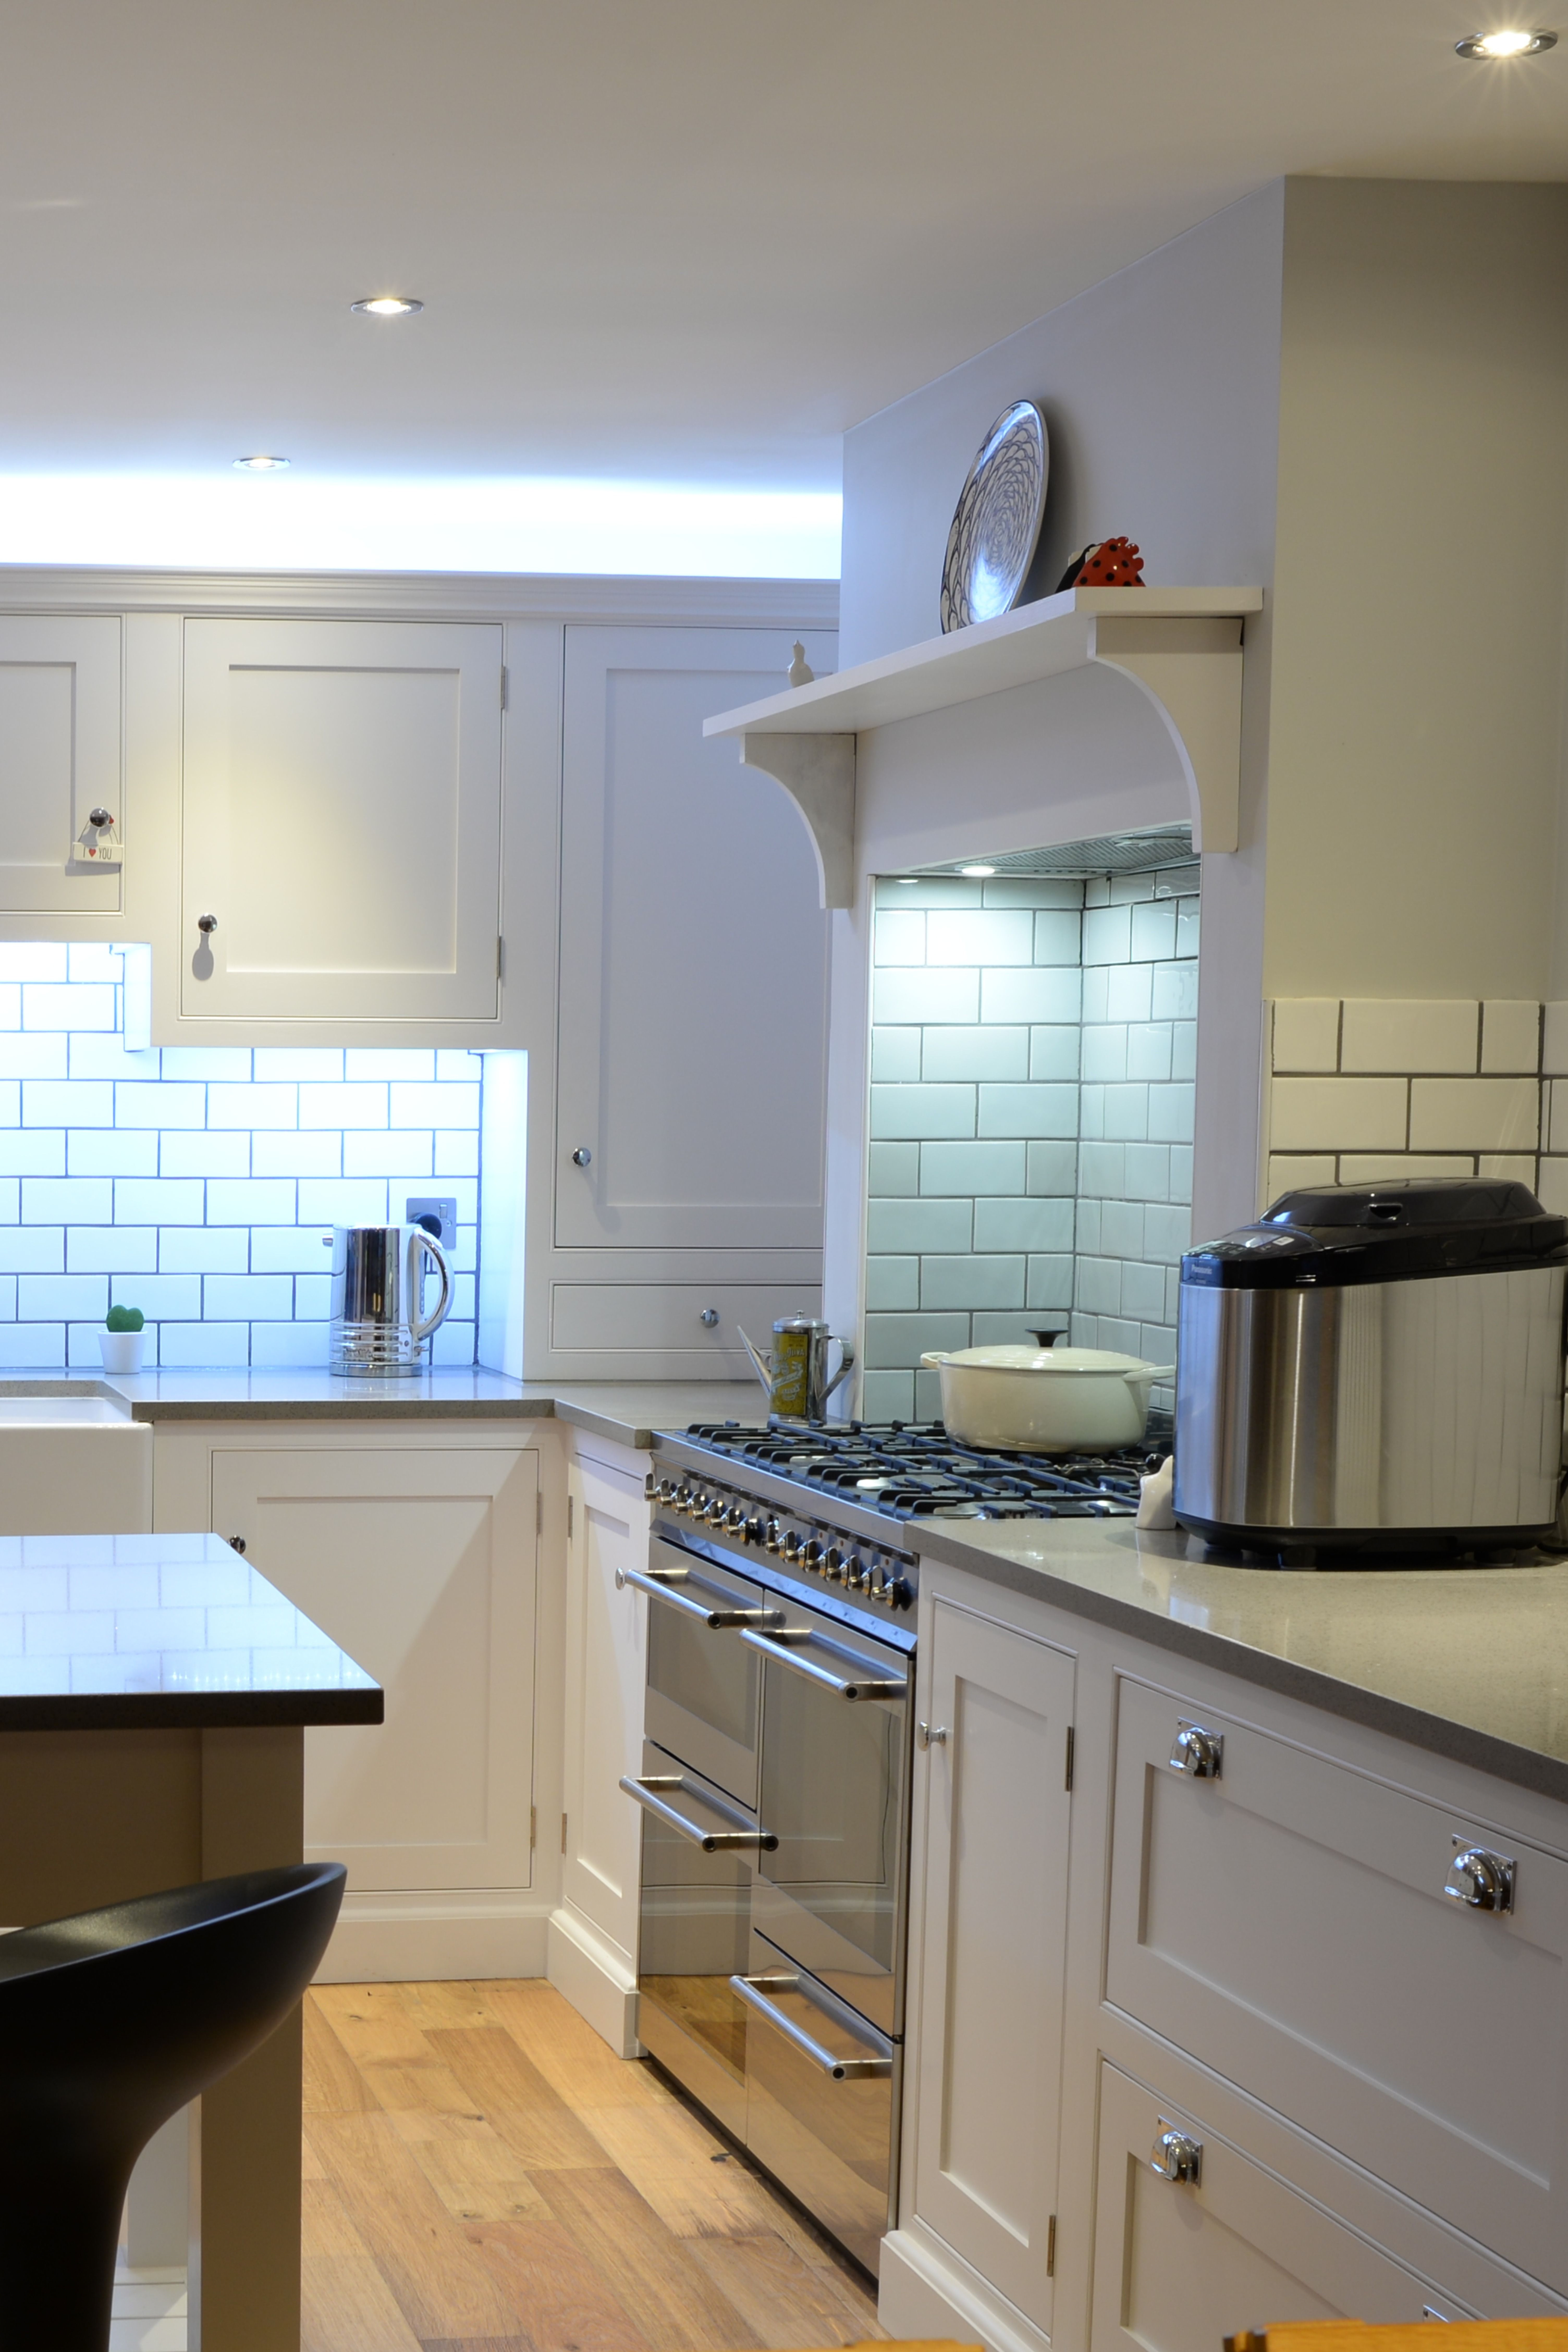 Modern Off White Handmade Bespoke Kitchen Kitchen Design Small White Kitchen Cupboards Kitchen Installation